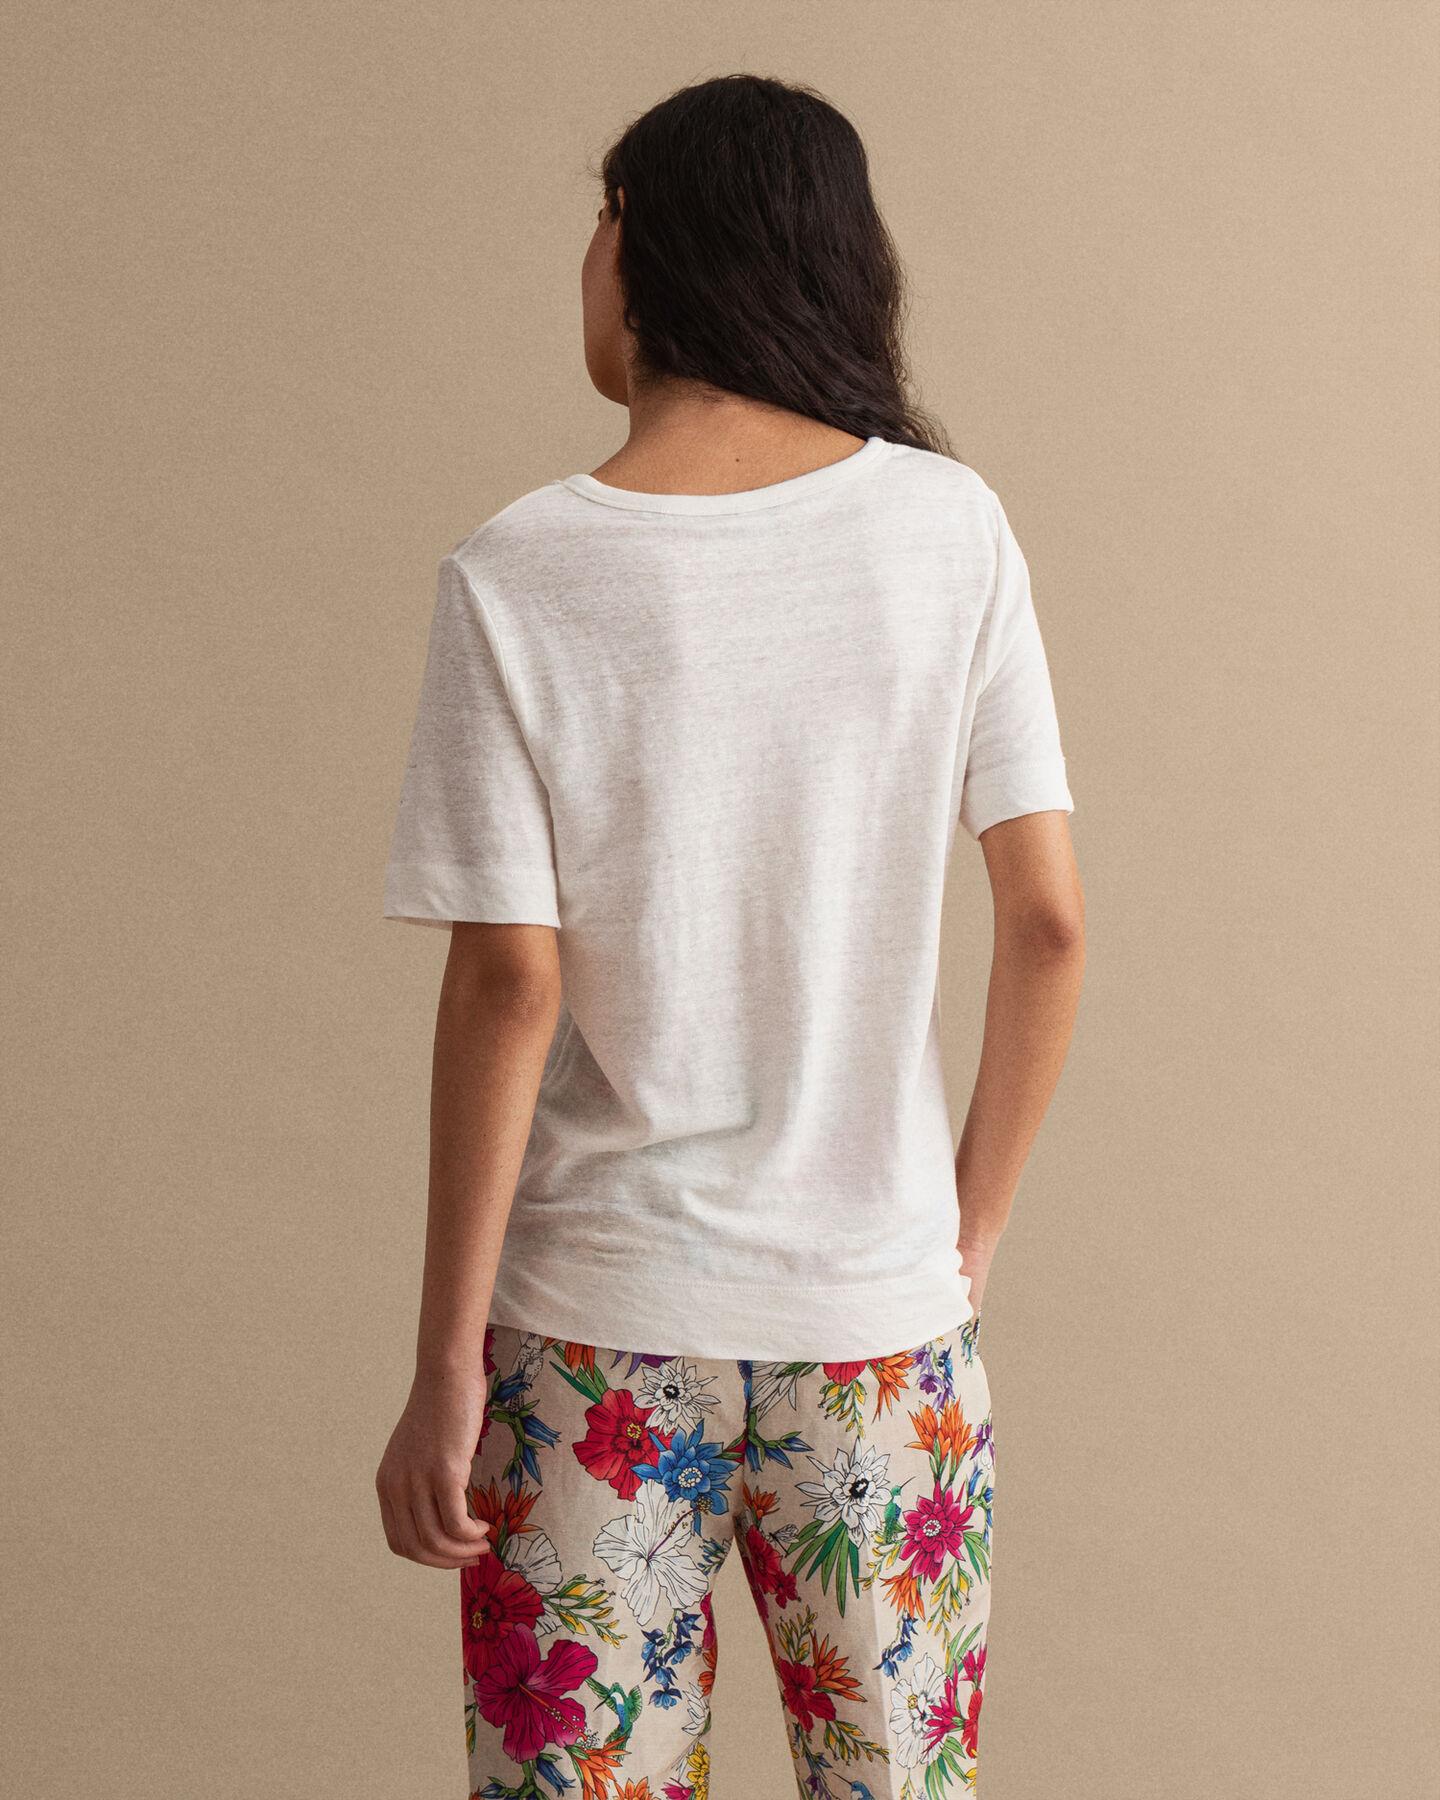 T-shirt i linne